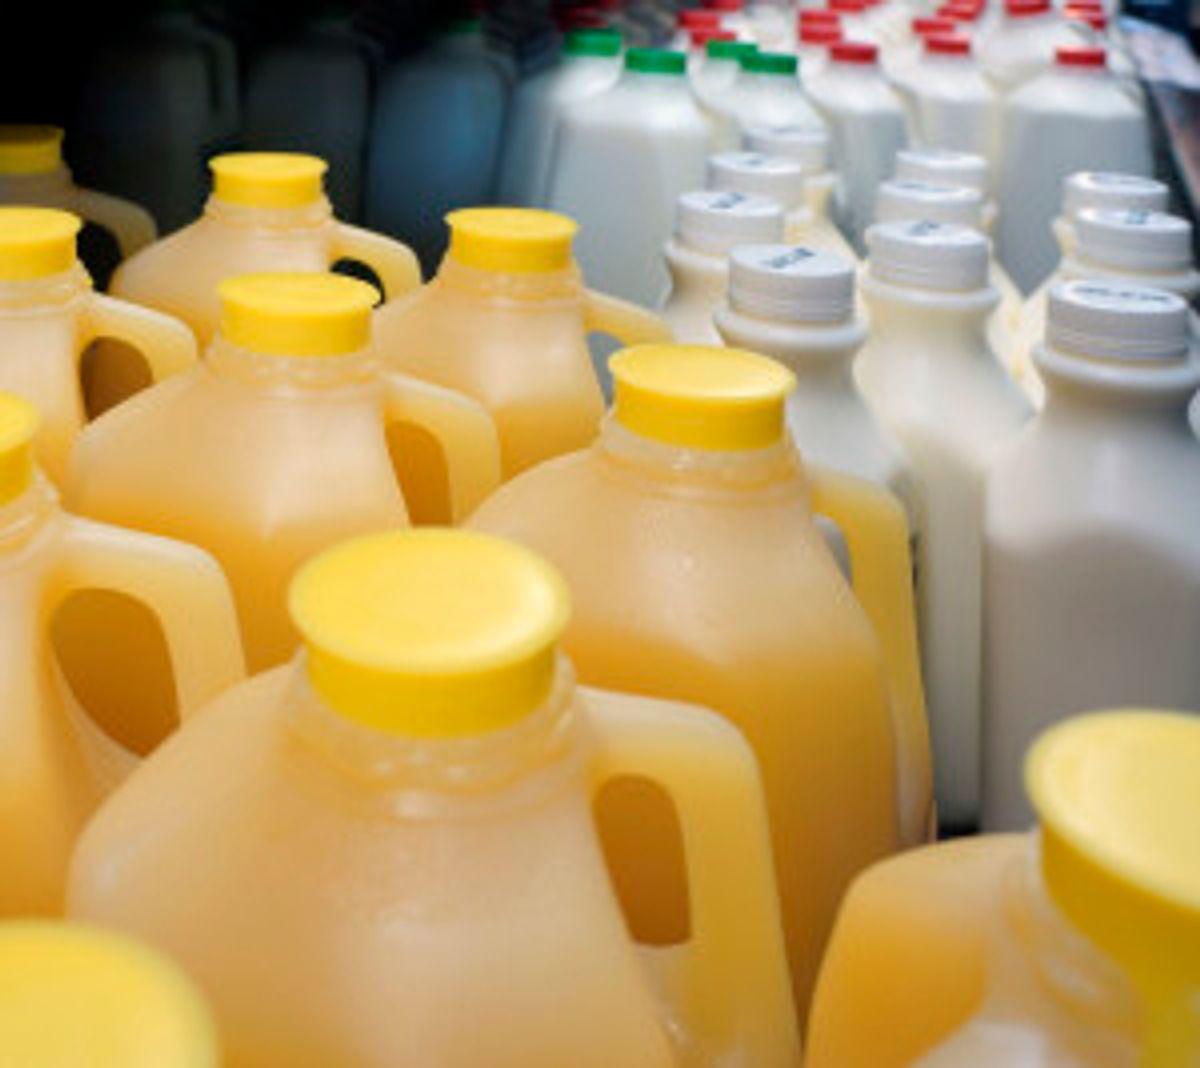 Penske Logistics to Appear on Cold Chain Food Logistics Webcast